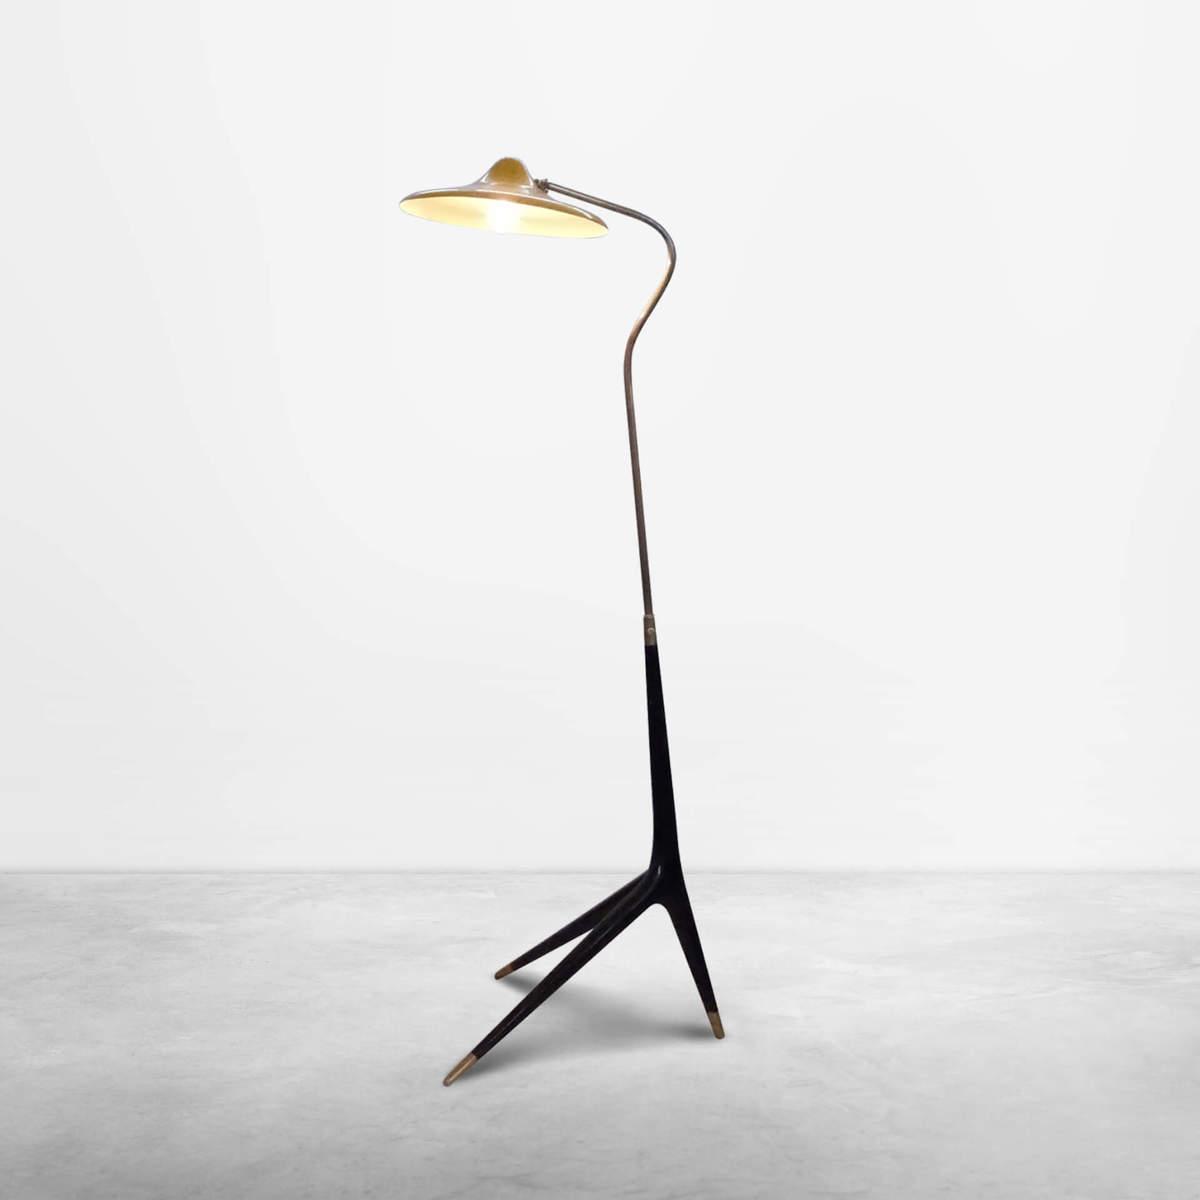 italian Mid-Century Modern, Floor Lamp in the Style of Franco Albini, 1950s